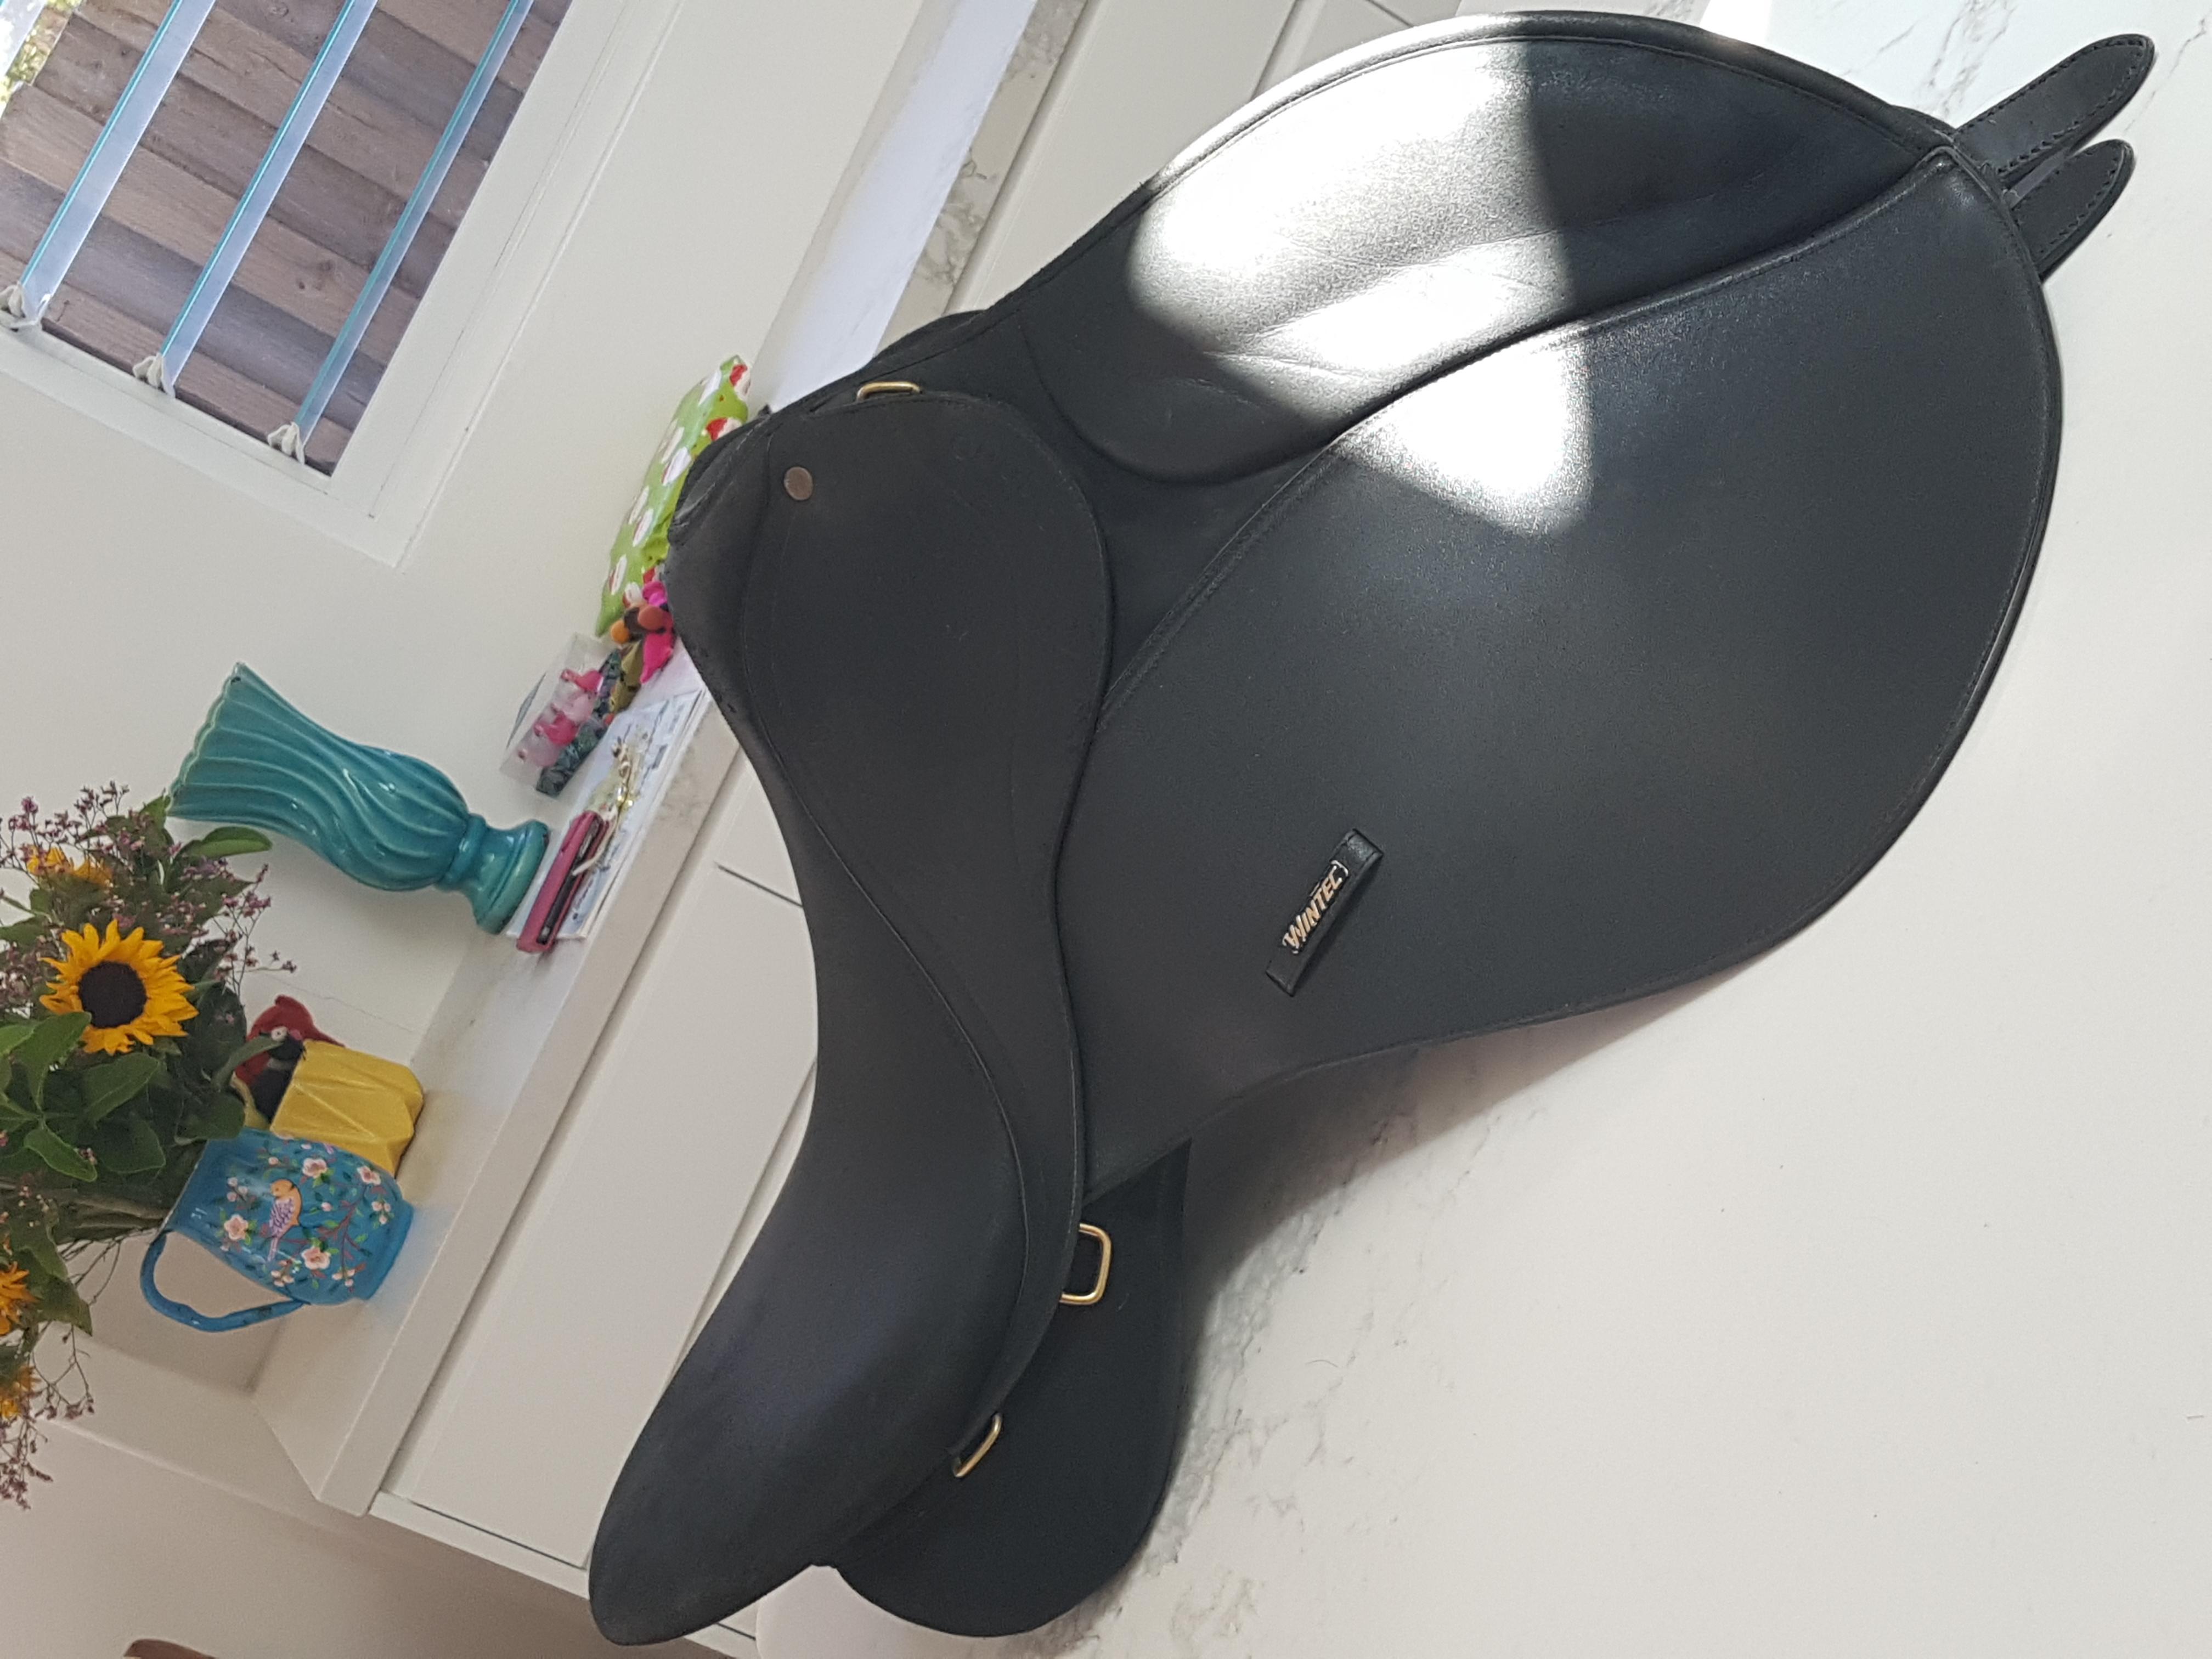 Wintec 2000 All Purpose 17 inch saddle